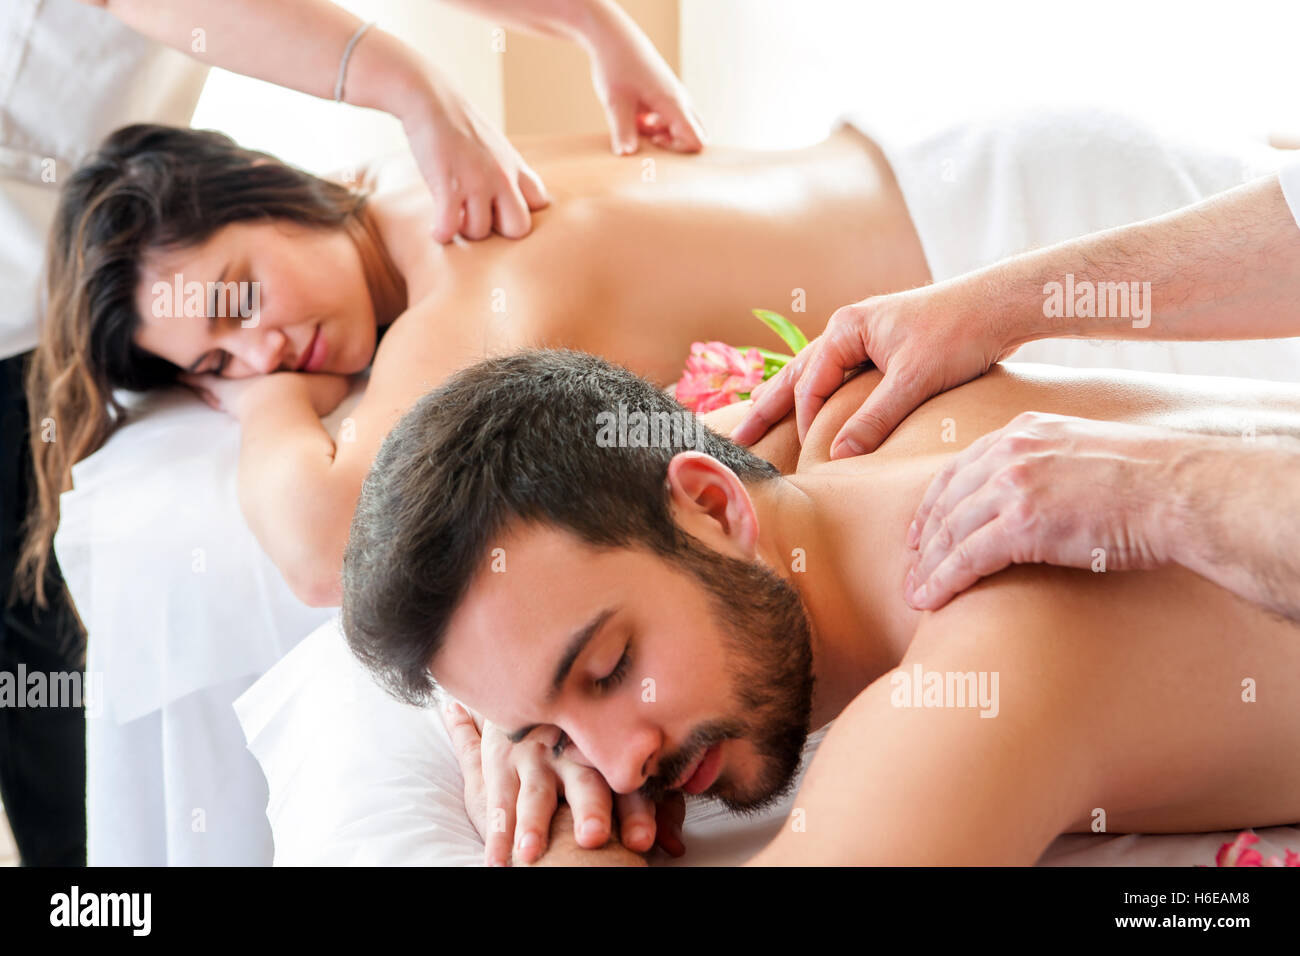 Bleeding pussy vagina penetration